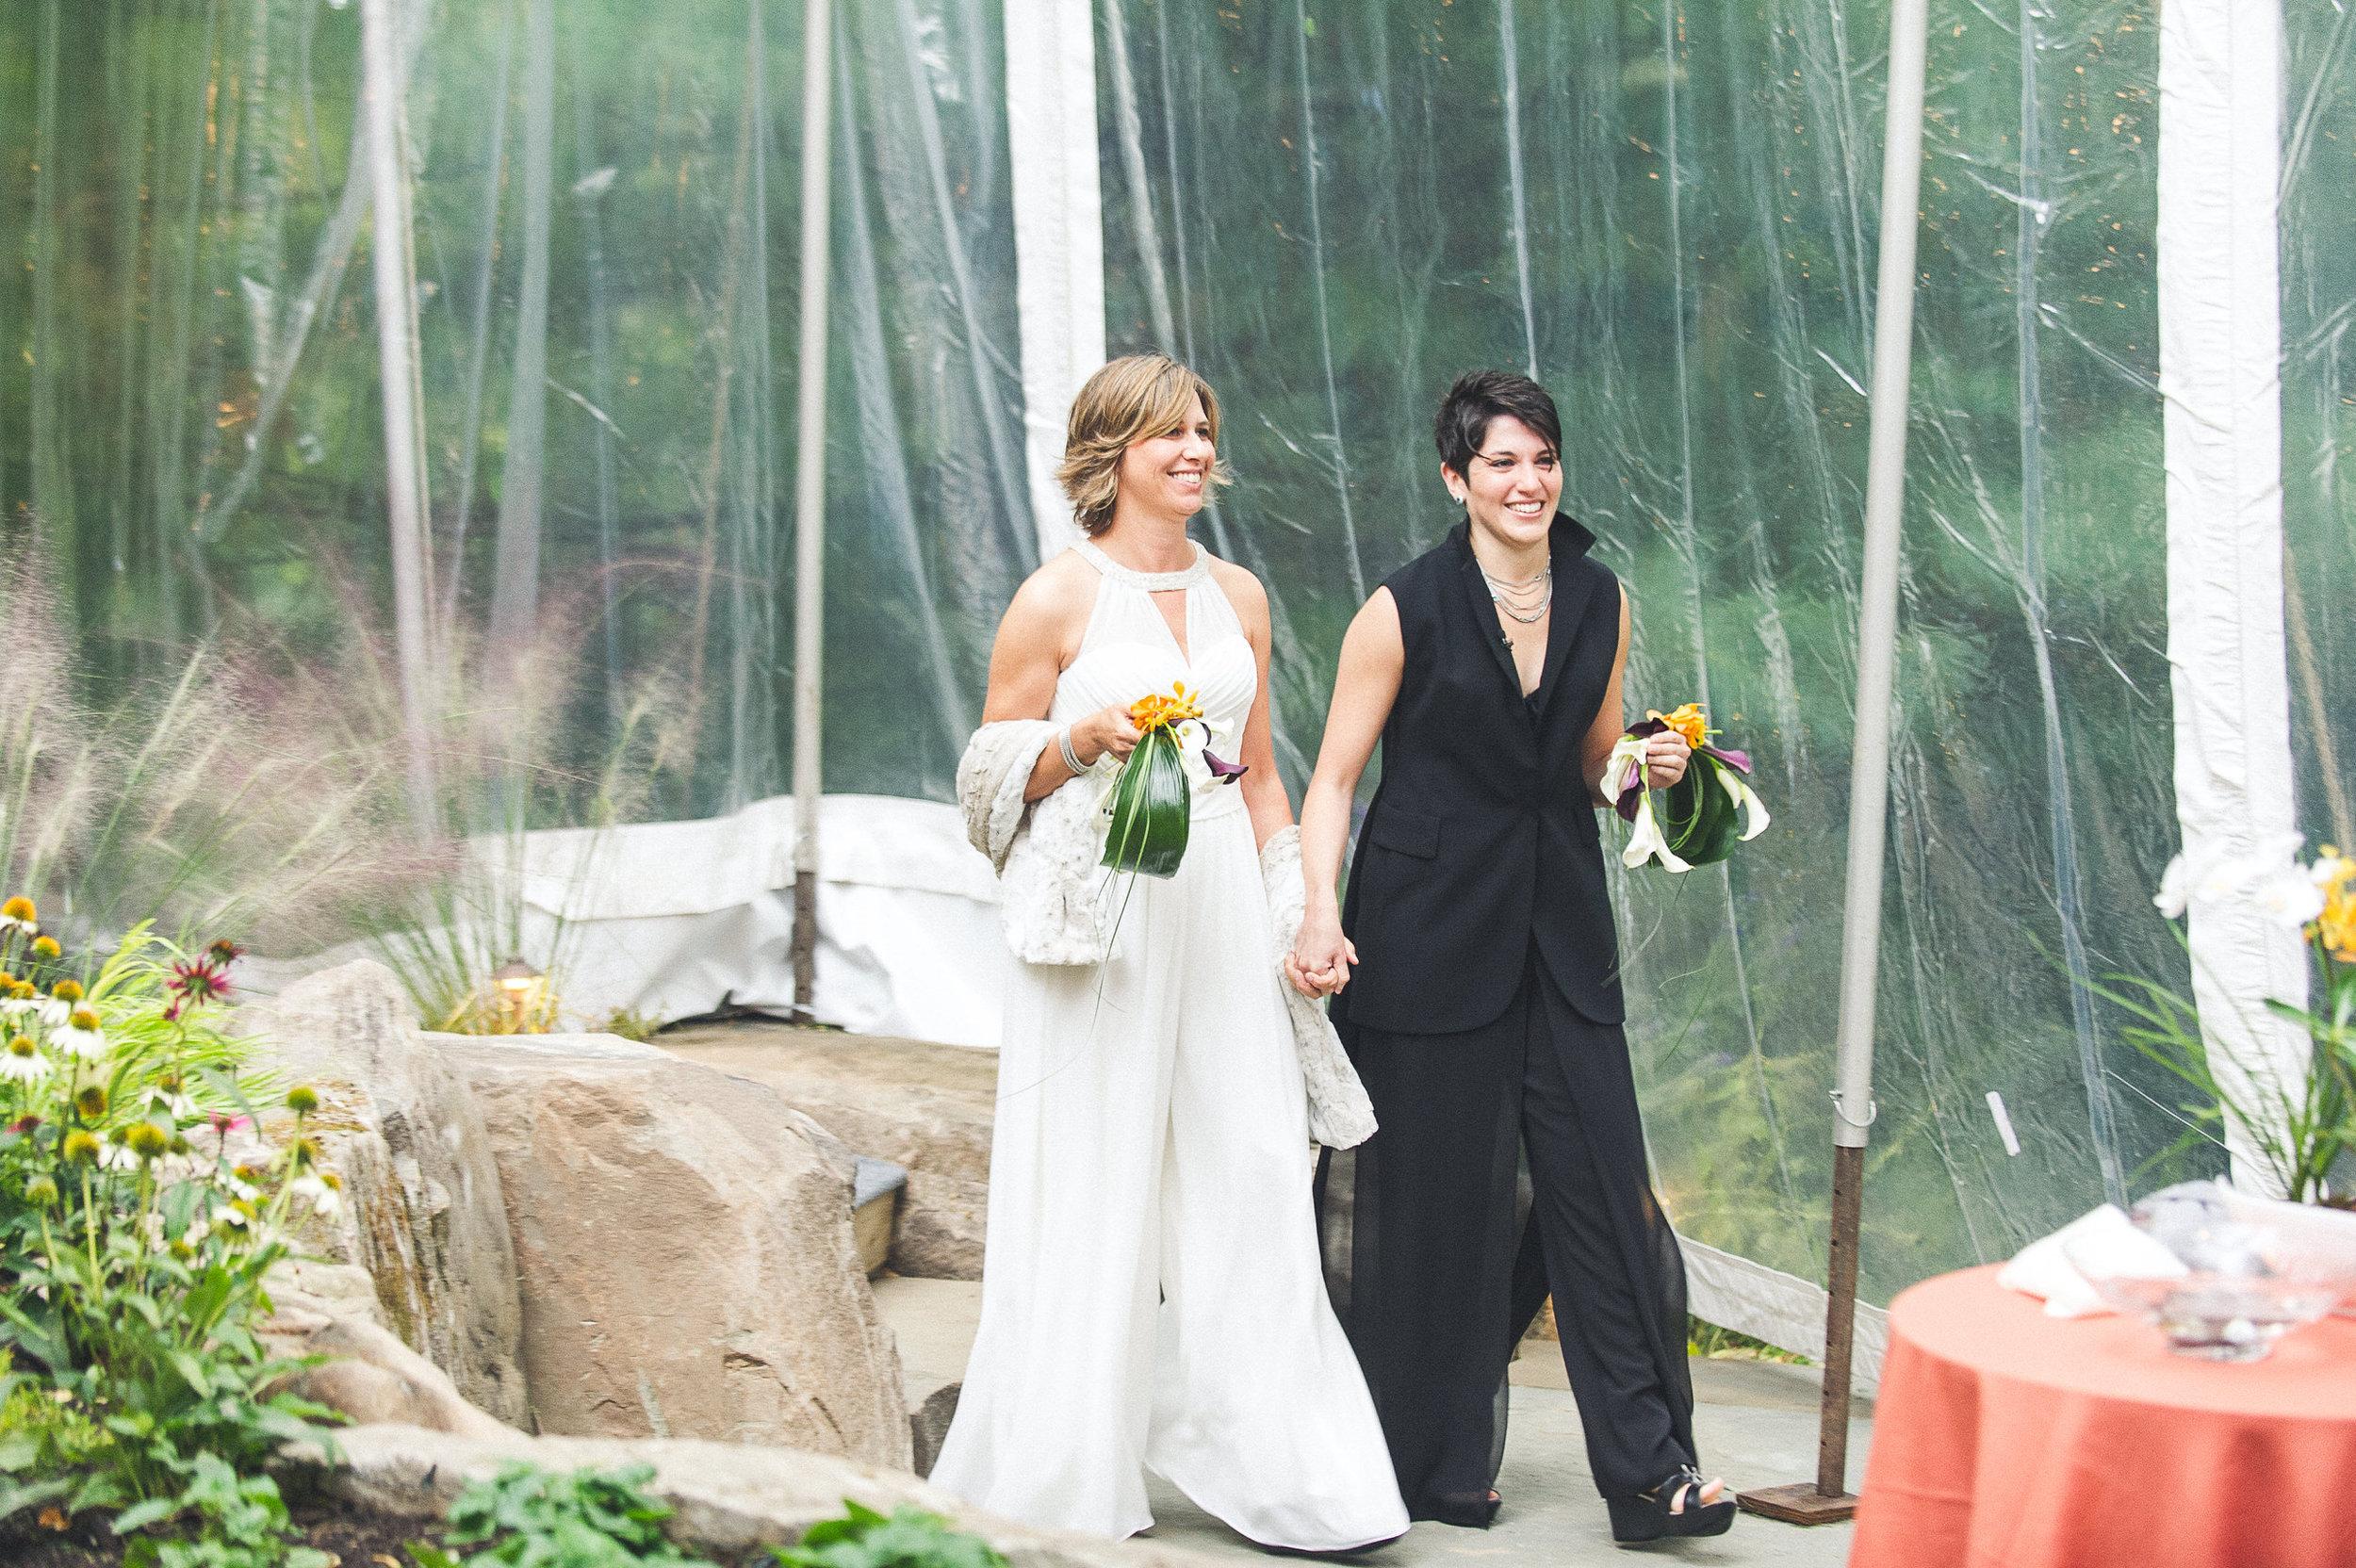 12 Aribella Events Philadelphia Wedding Planner At Home Wedding Processional.jpg